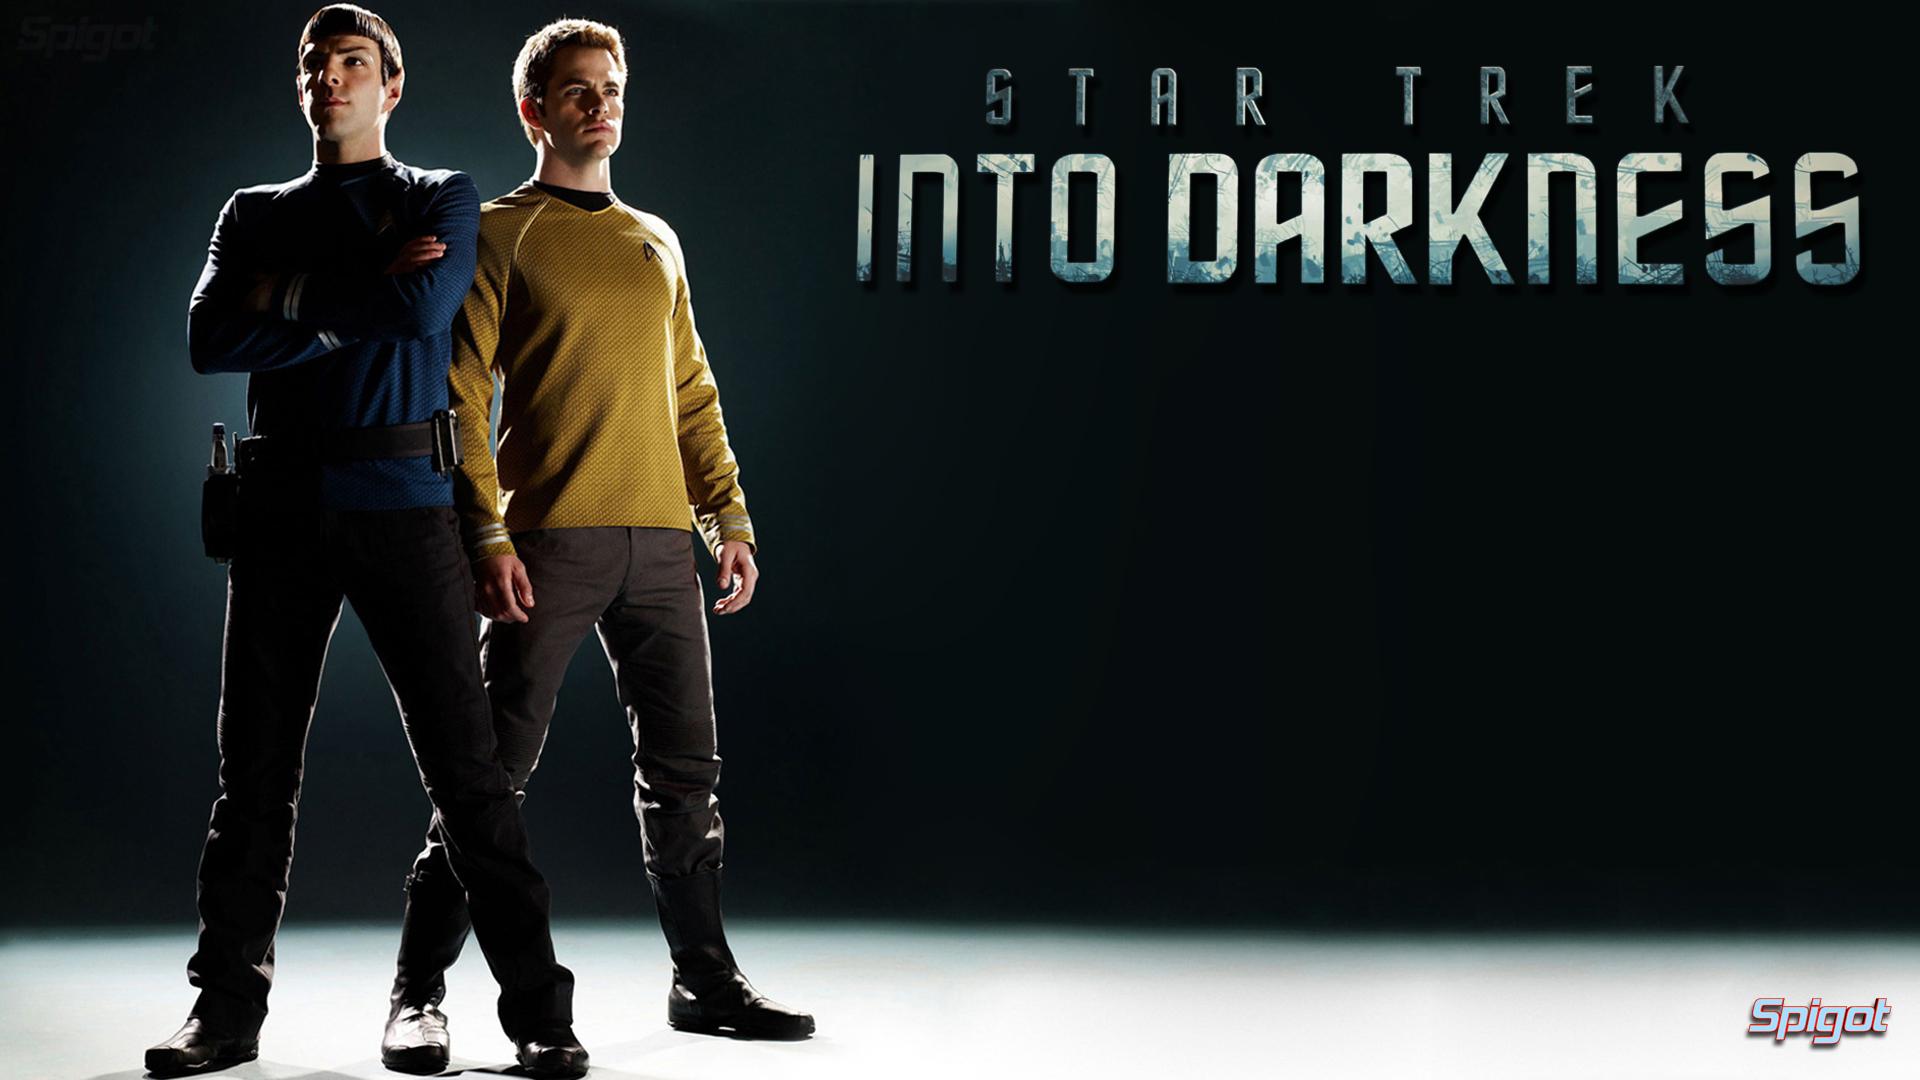 star trek into darkness movie wallpaper backgrounds 1920x1080